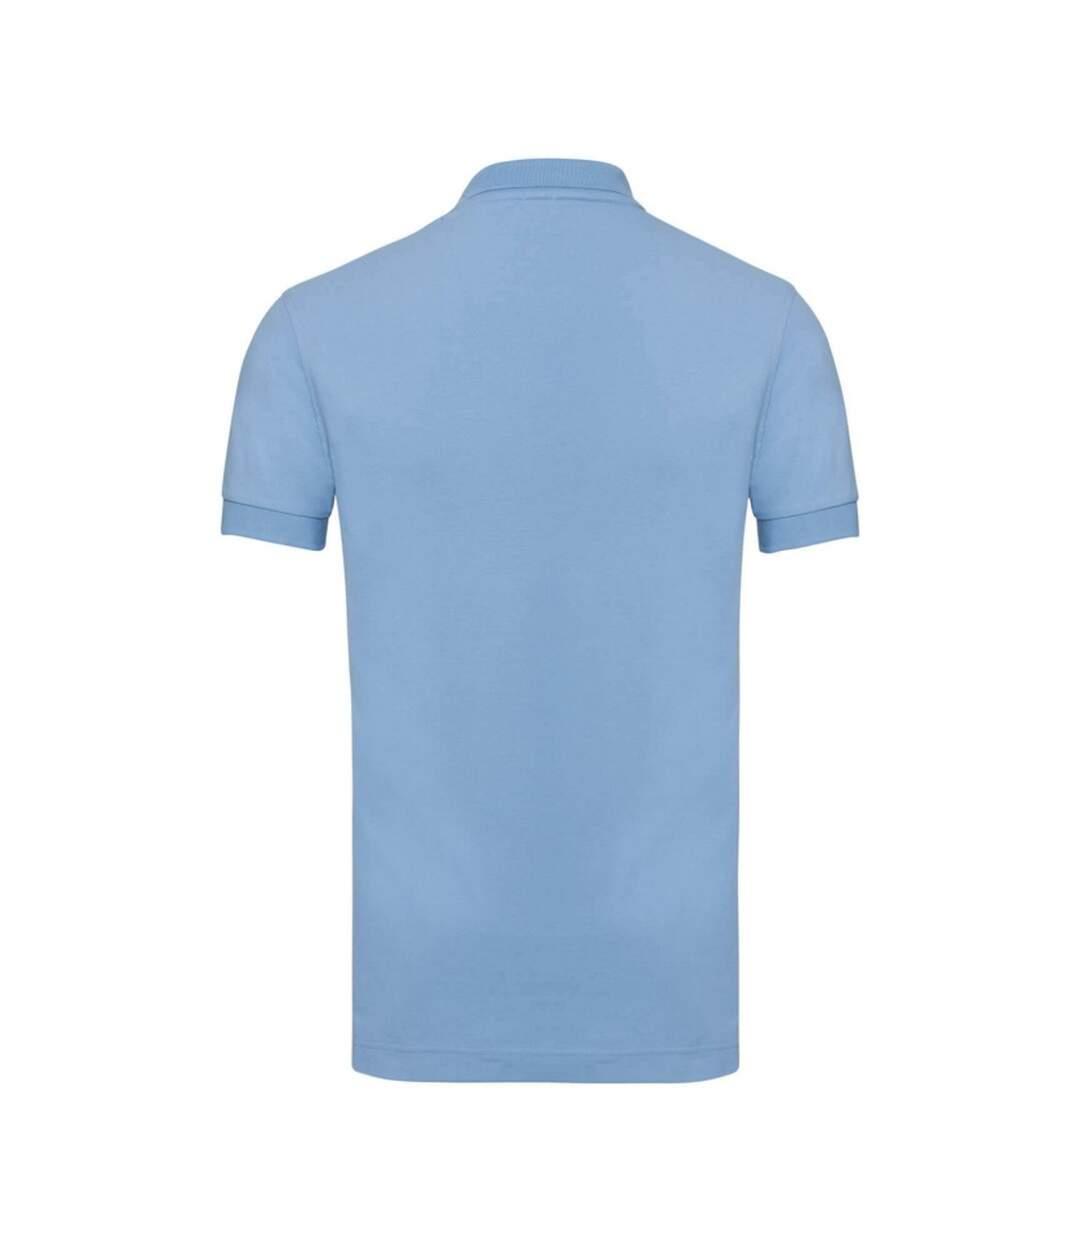 Russell Mens Stretch Short Sleeve Polo Shirt (Light Oxford) - UTBC3257